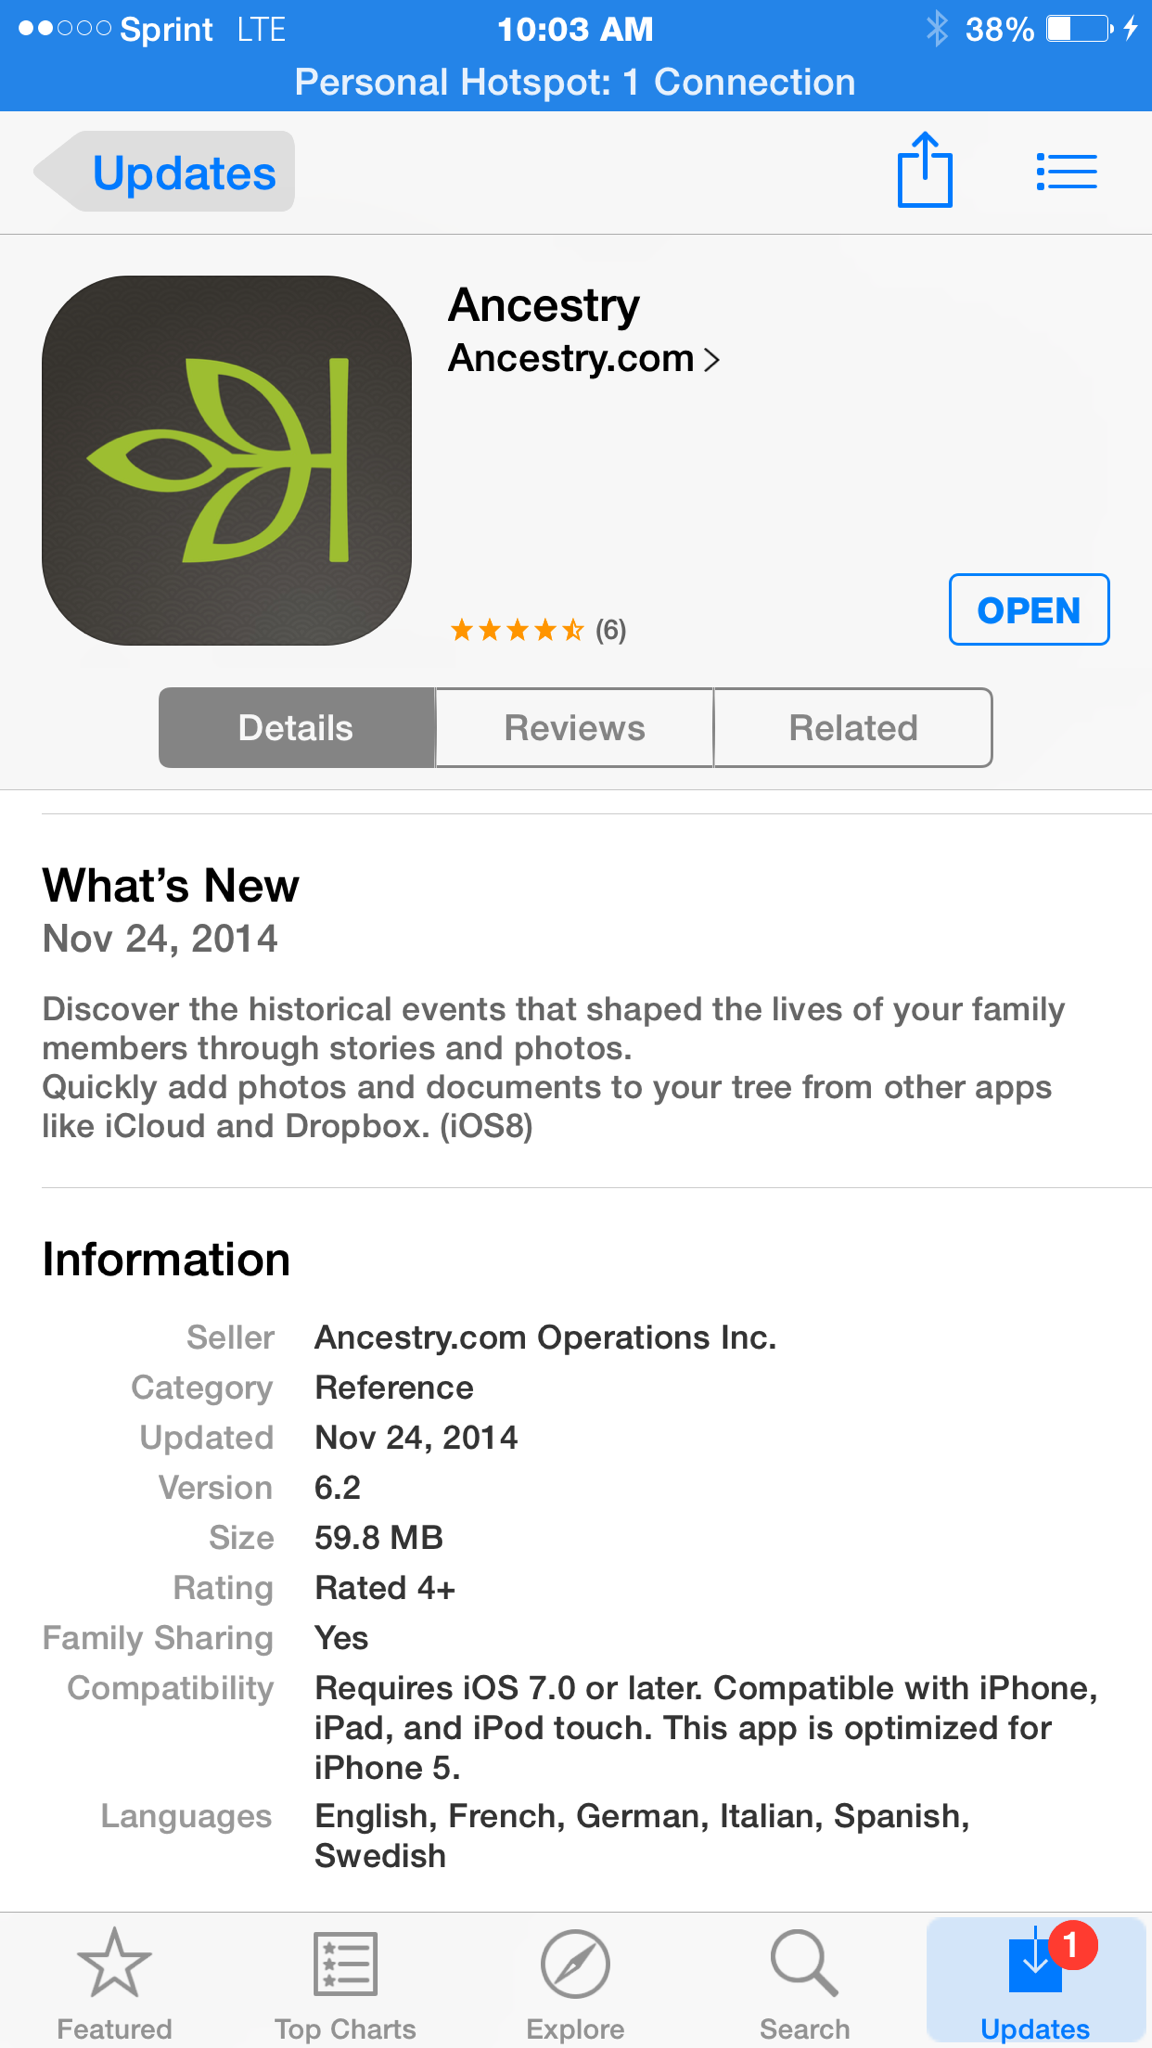 Ancestry App version 6.2